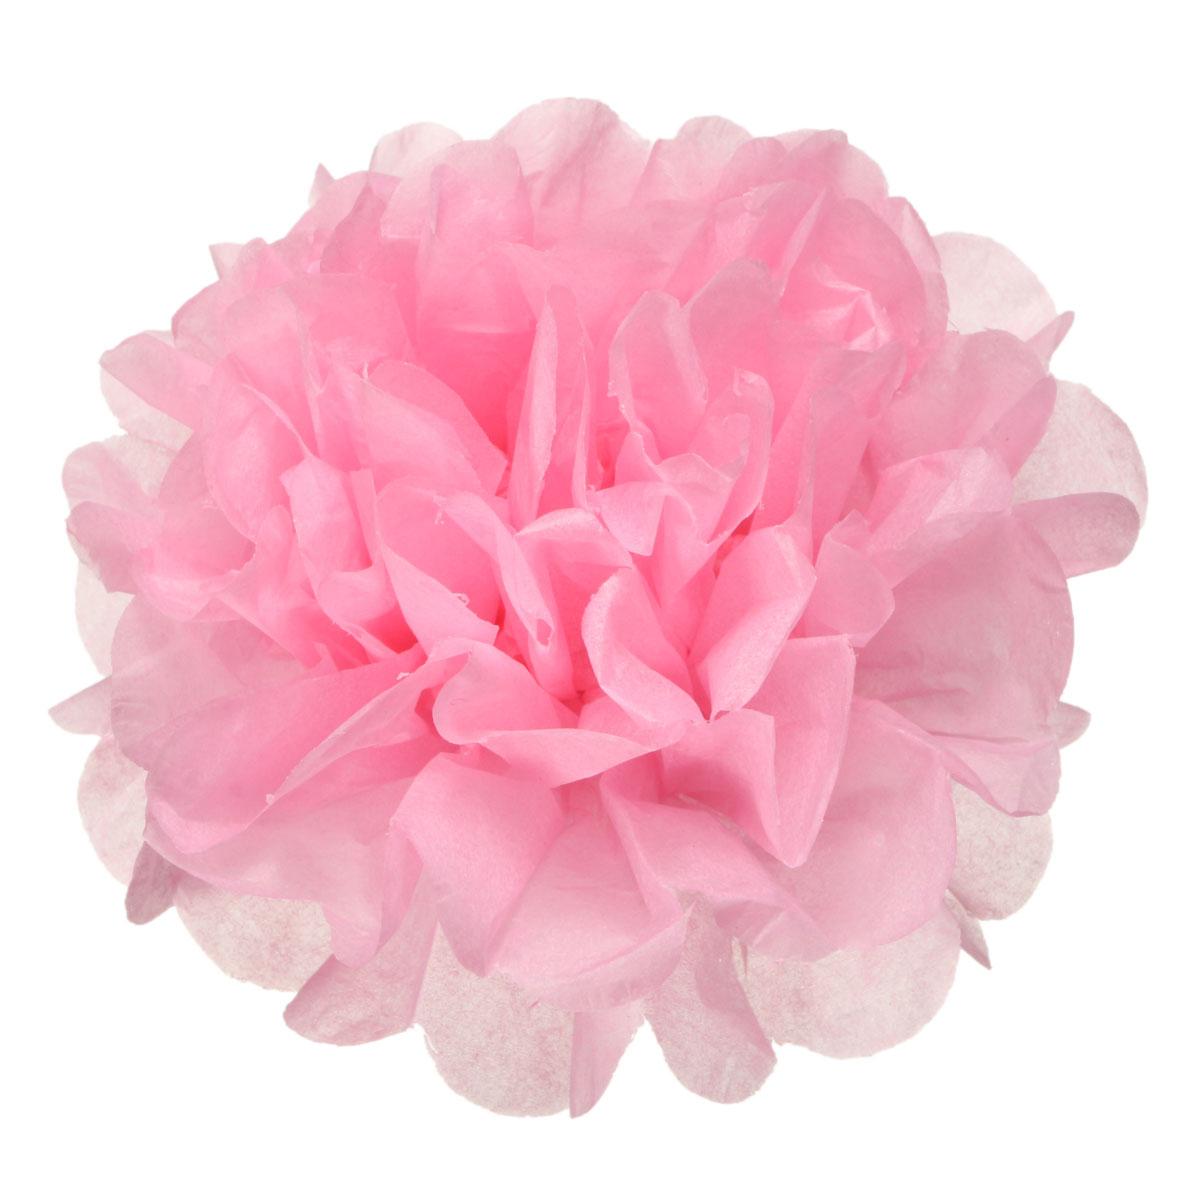 buy tissue paper pom poms